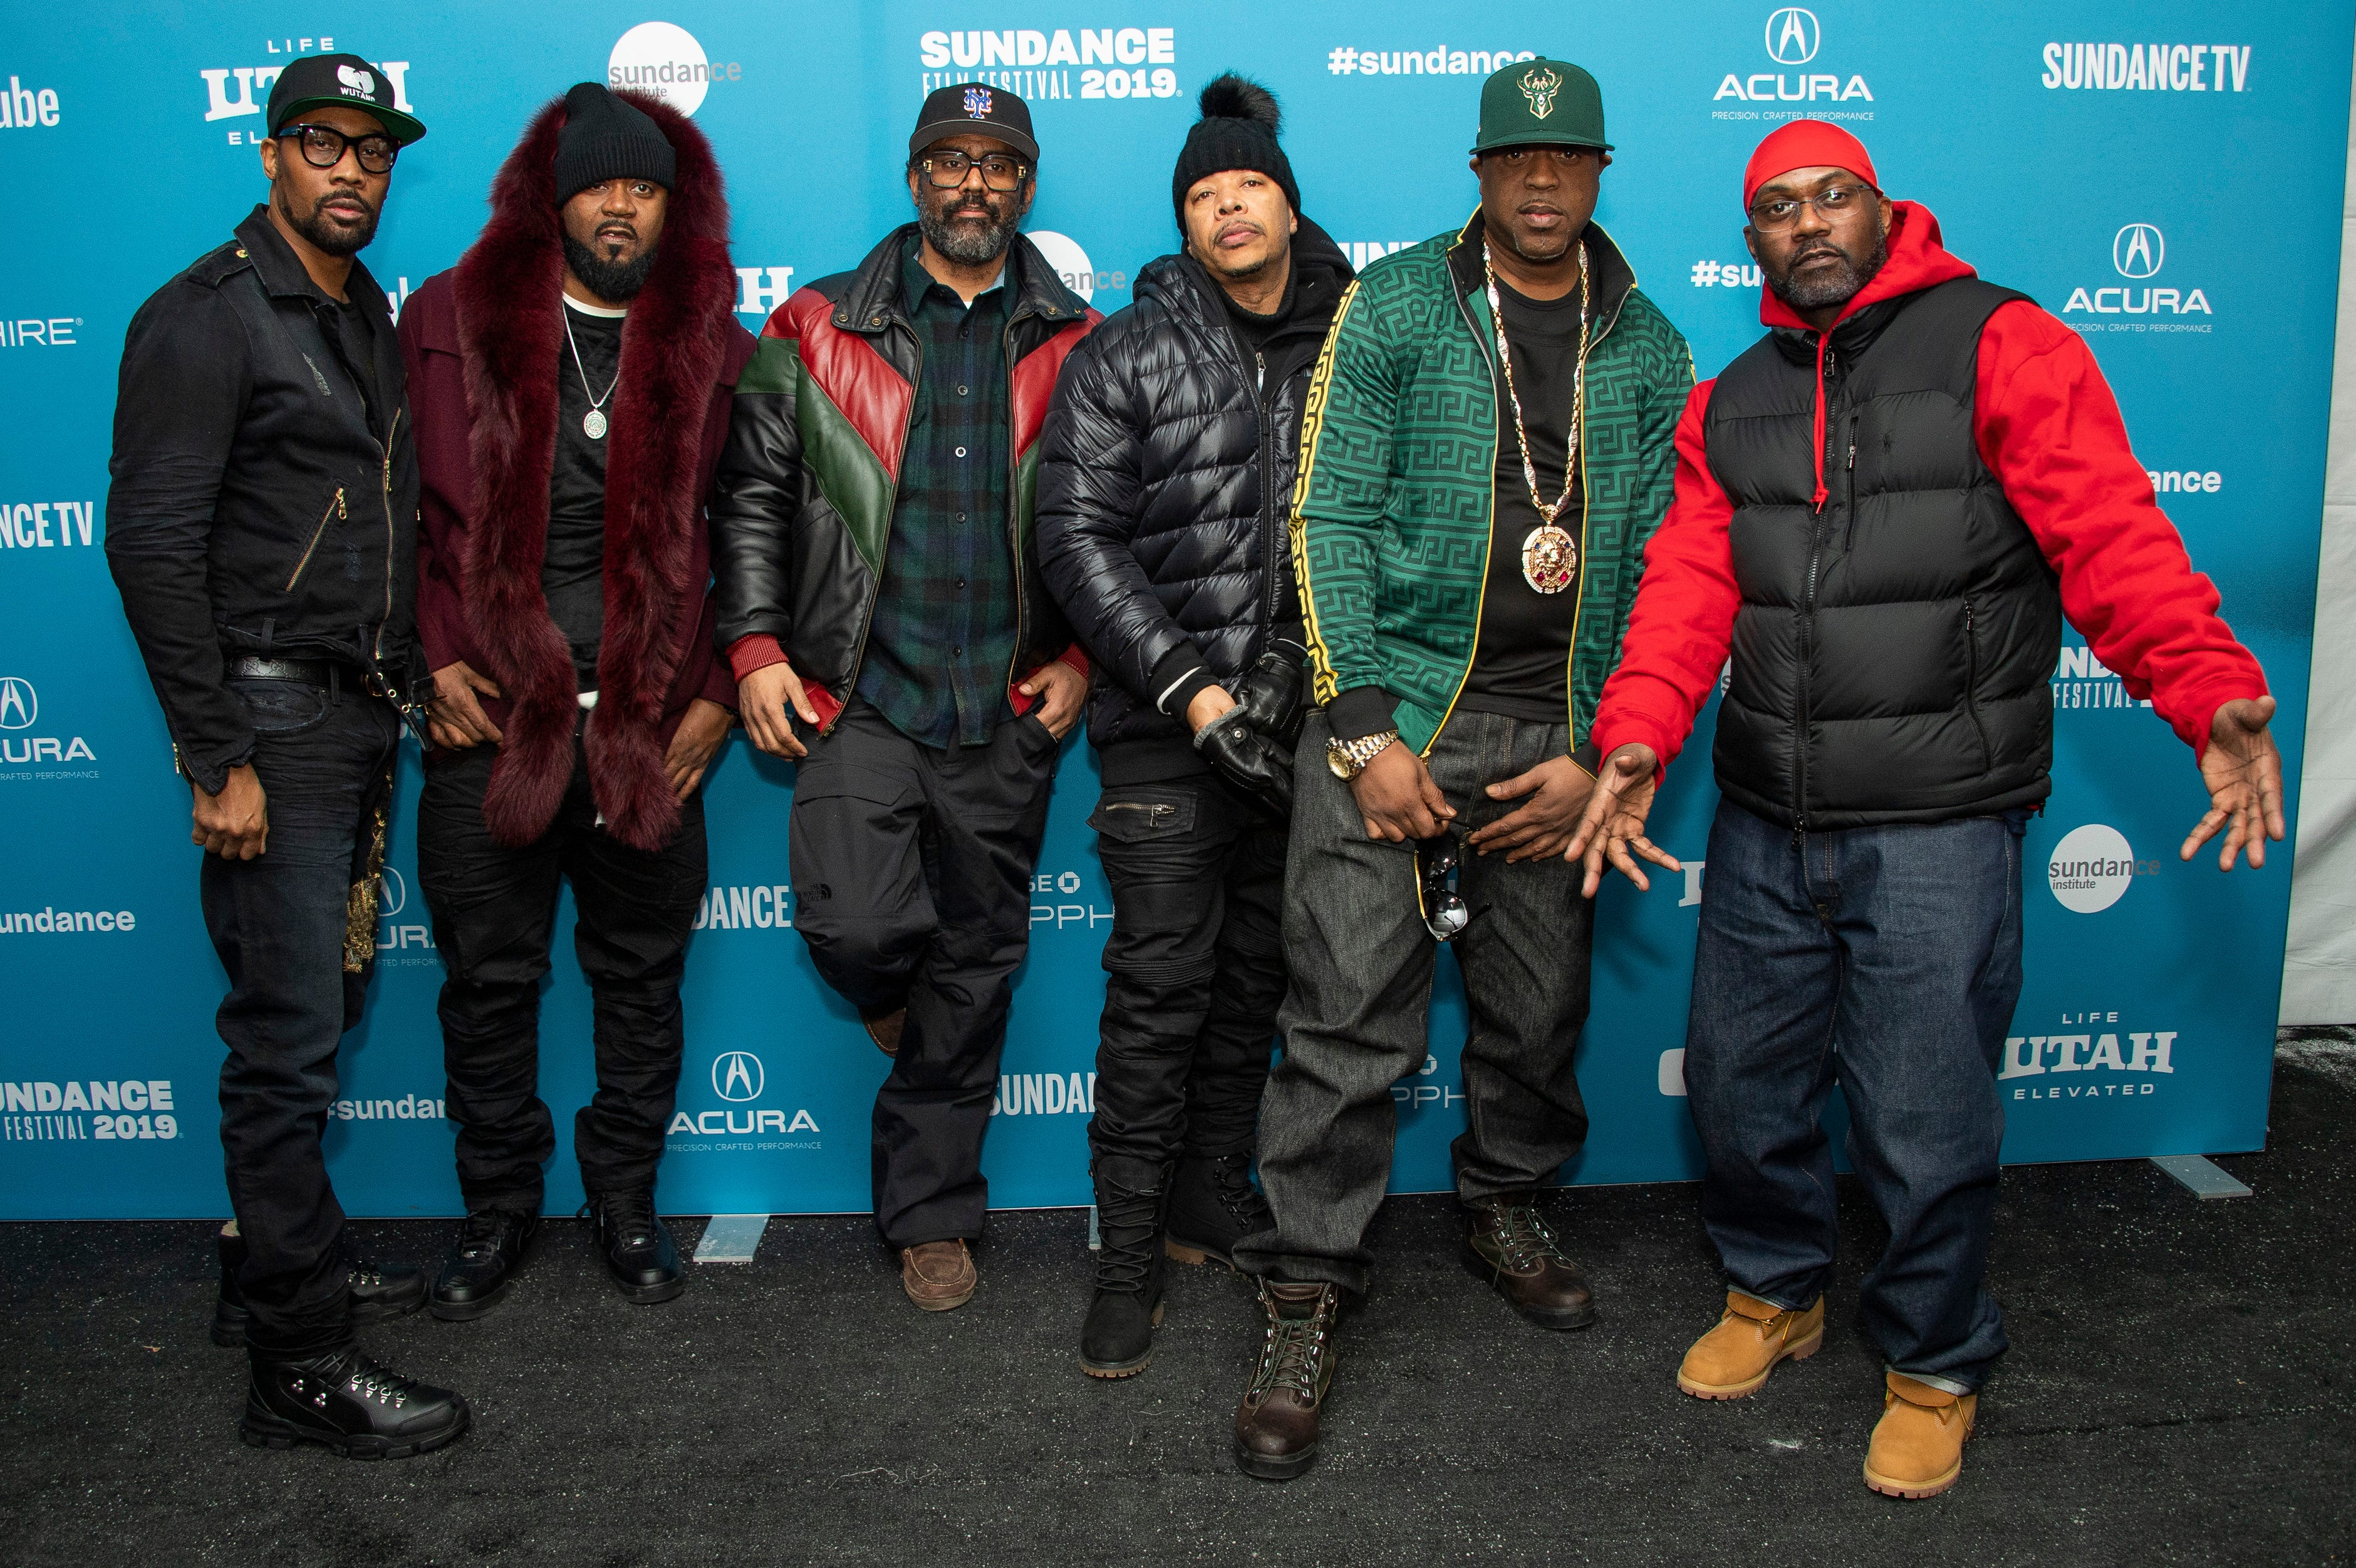 Hulu's 'Wu-Tang: An American Saga': RZA says new series is revealing